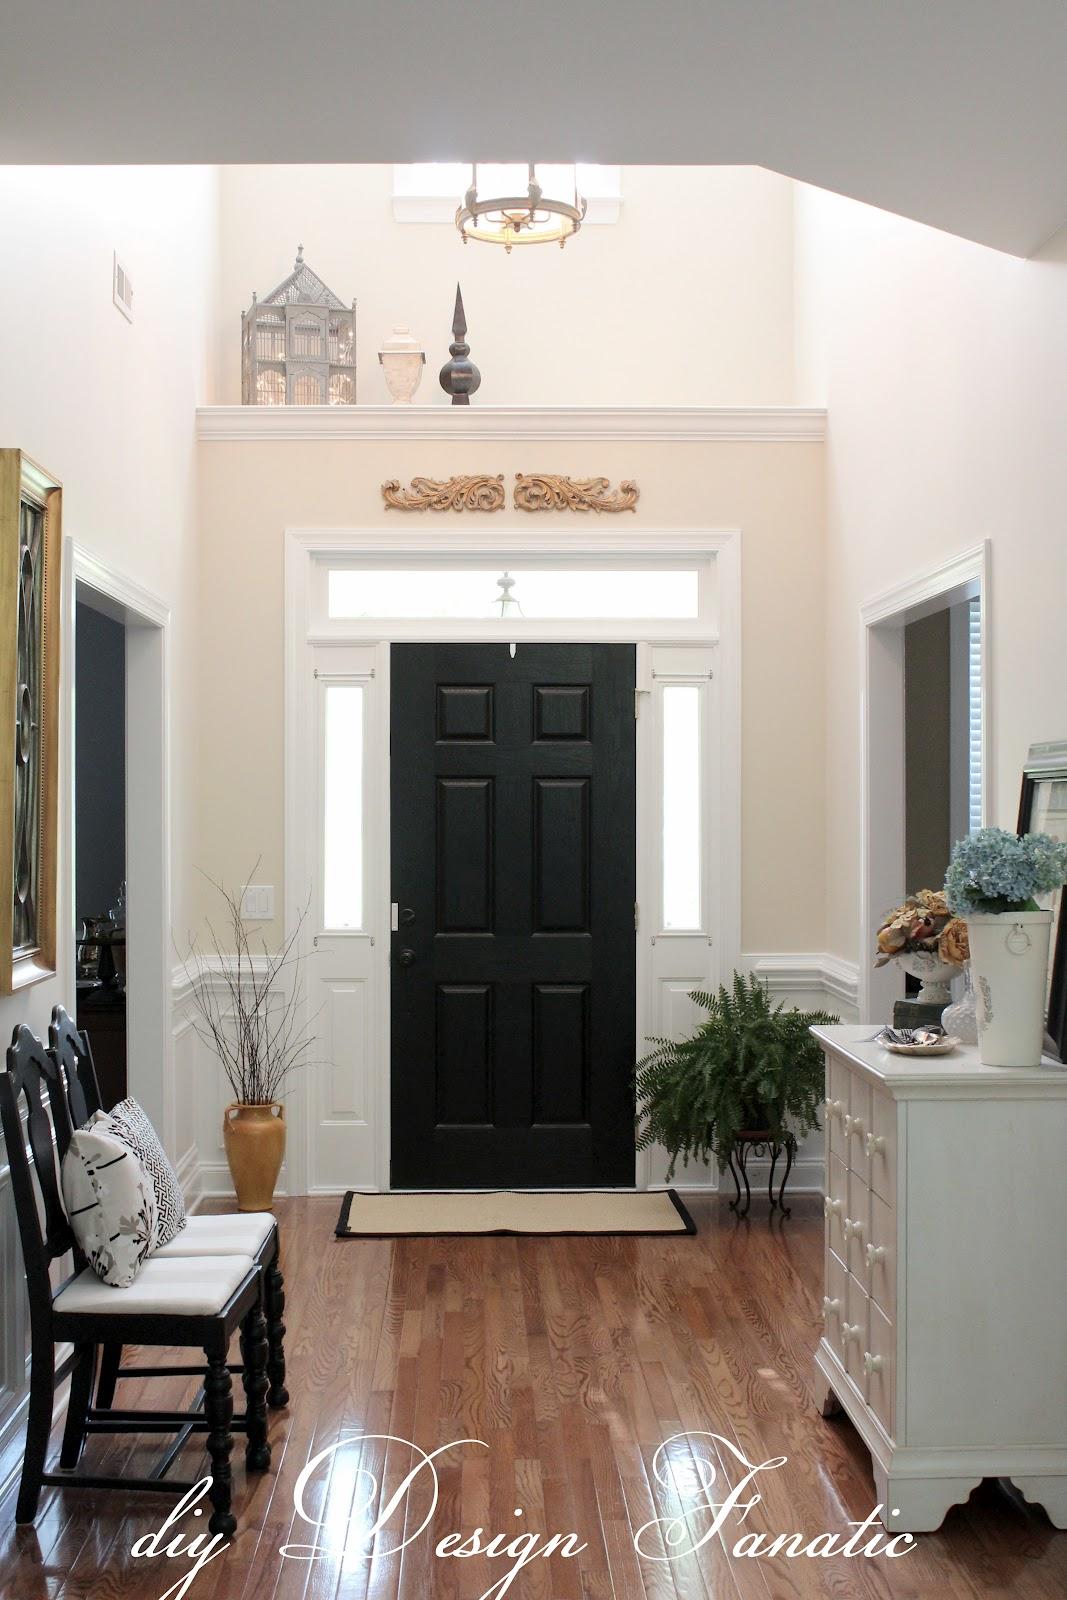 Diy design fanatic home tour for Front door foyer designs